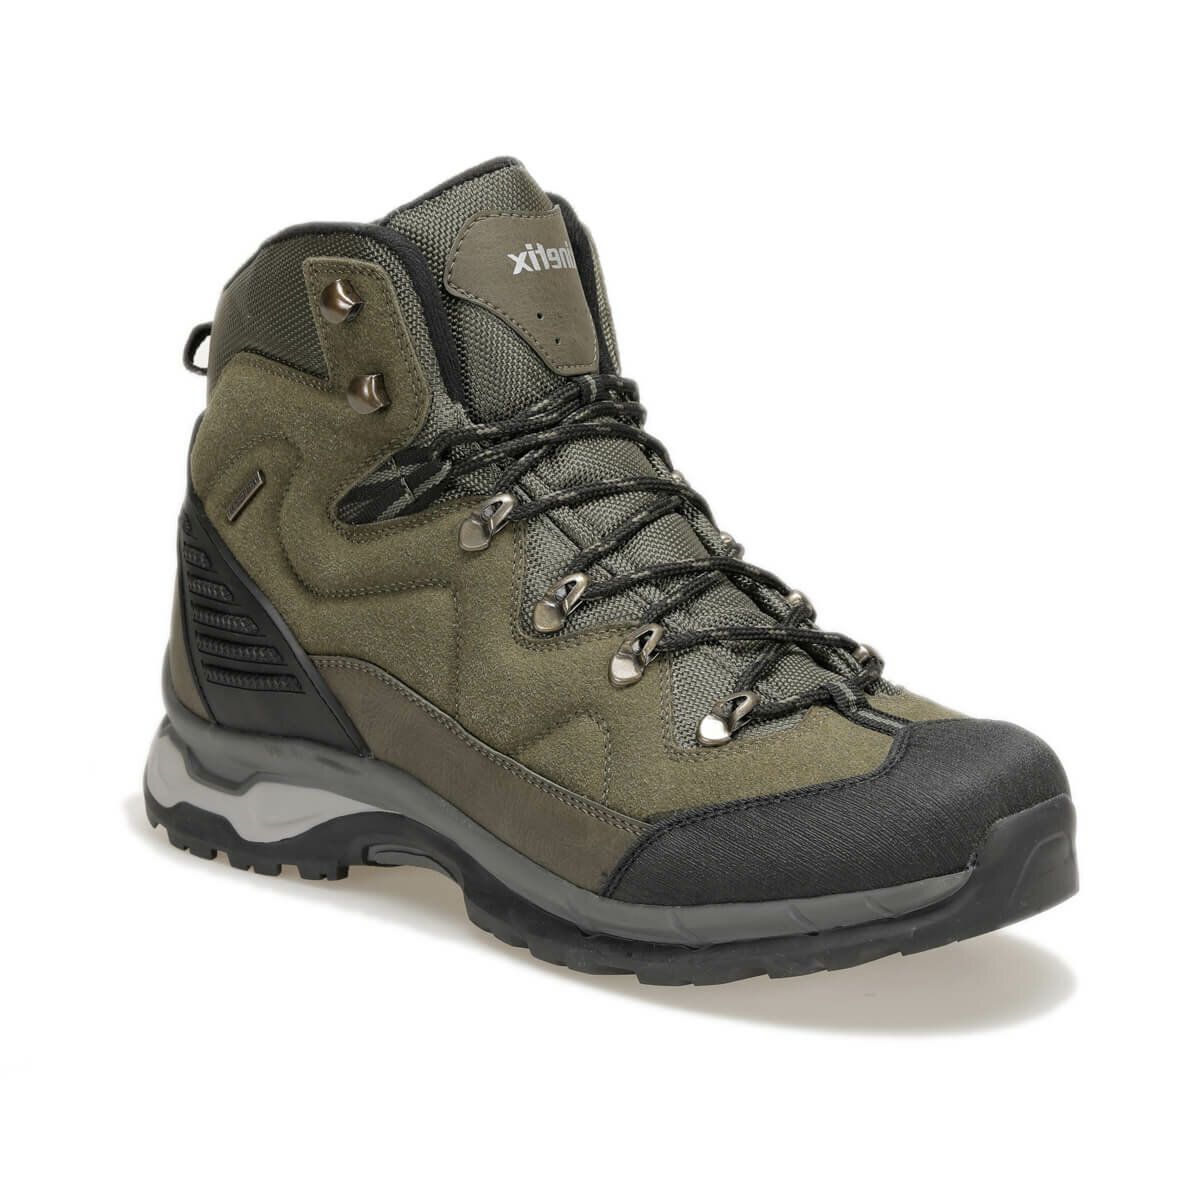 FLO CRESPO 9PR Khaki Male Boots KINETIX